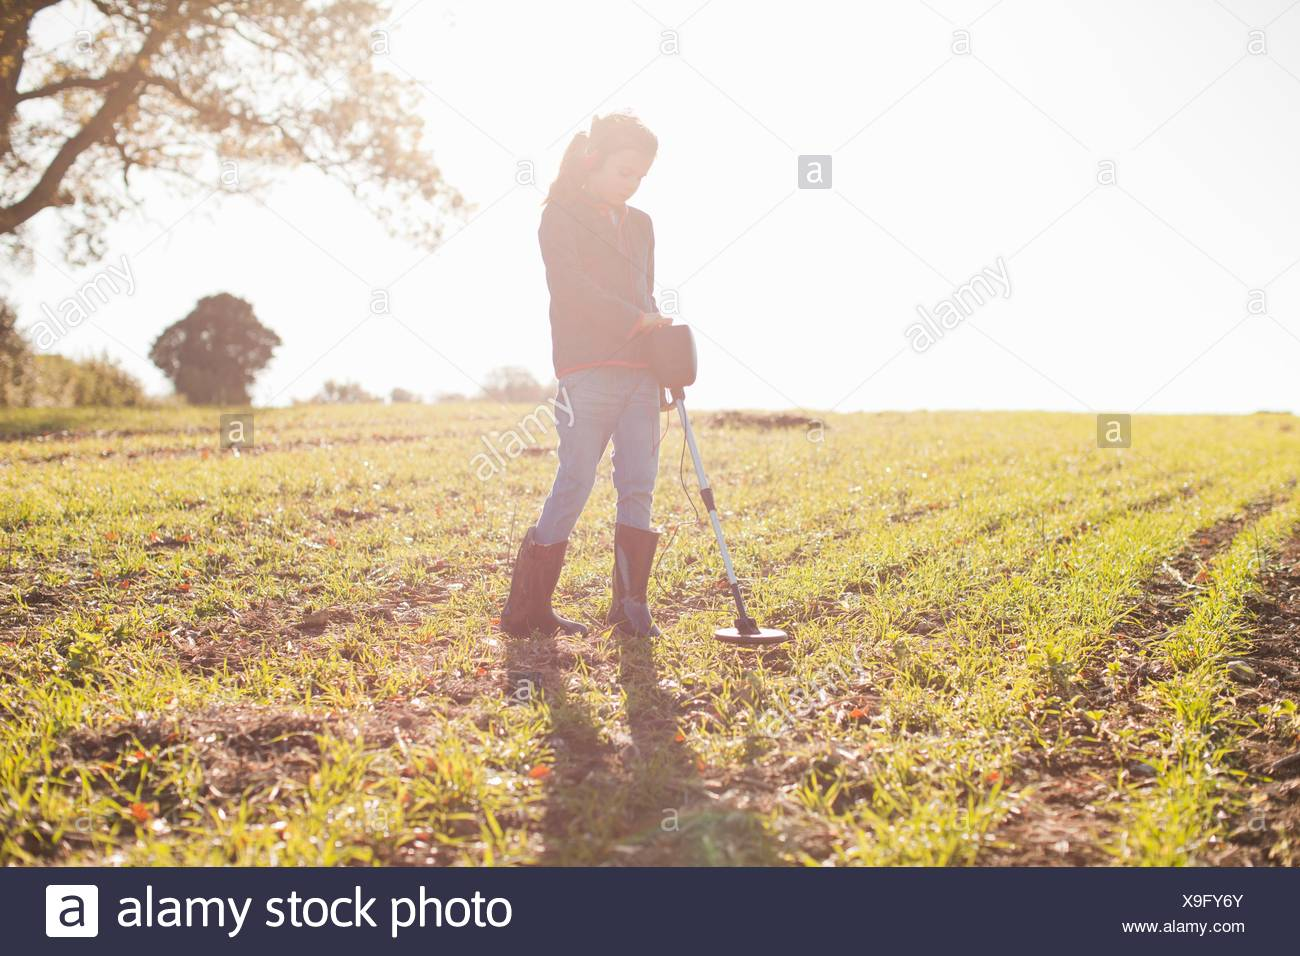 Girl wearing headphones searching with metal detector in sunlit field - Stock Image